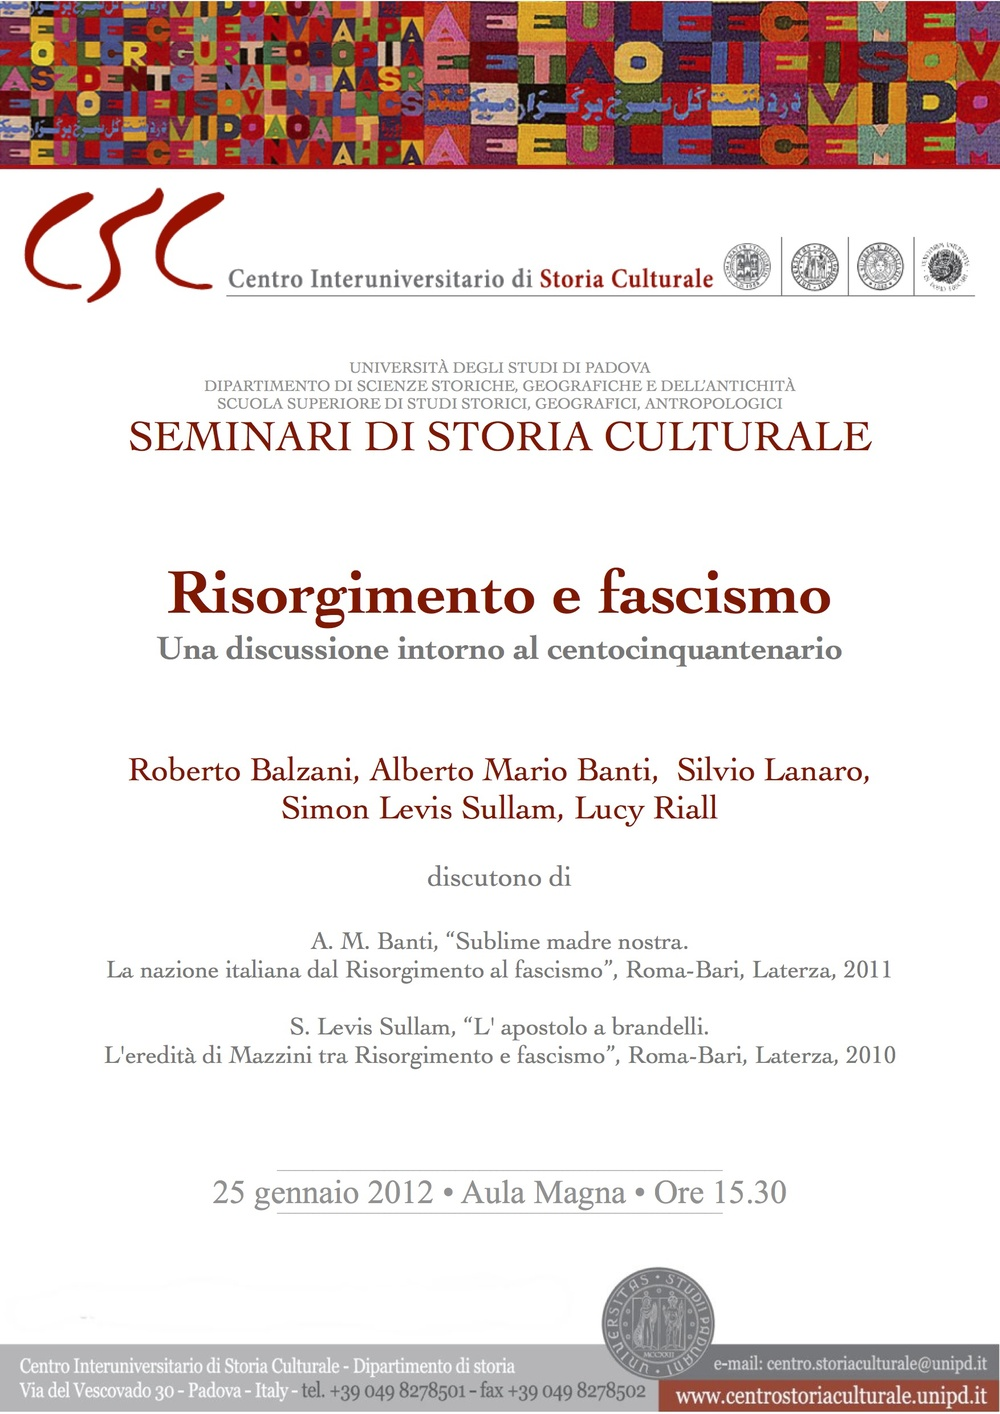 2012-01 (PD) Risorgimento e fascismo.jpg